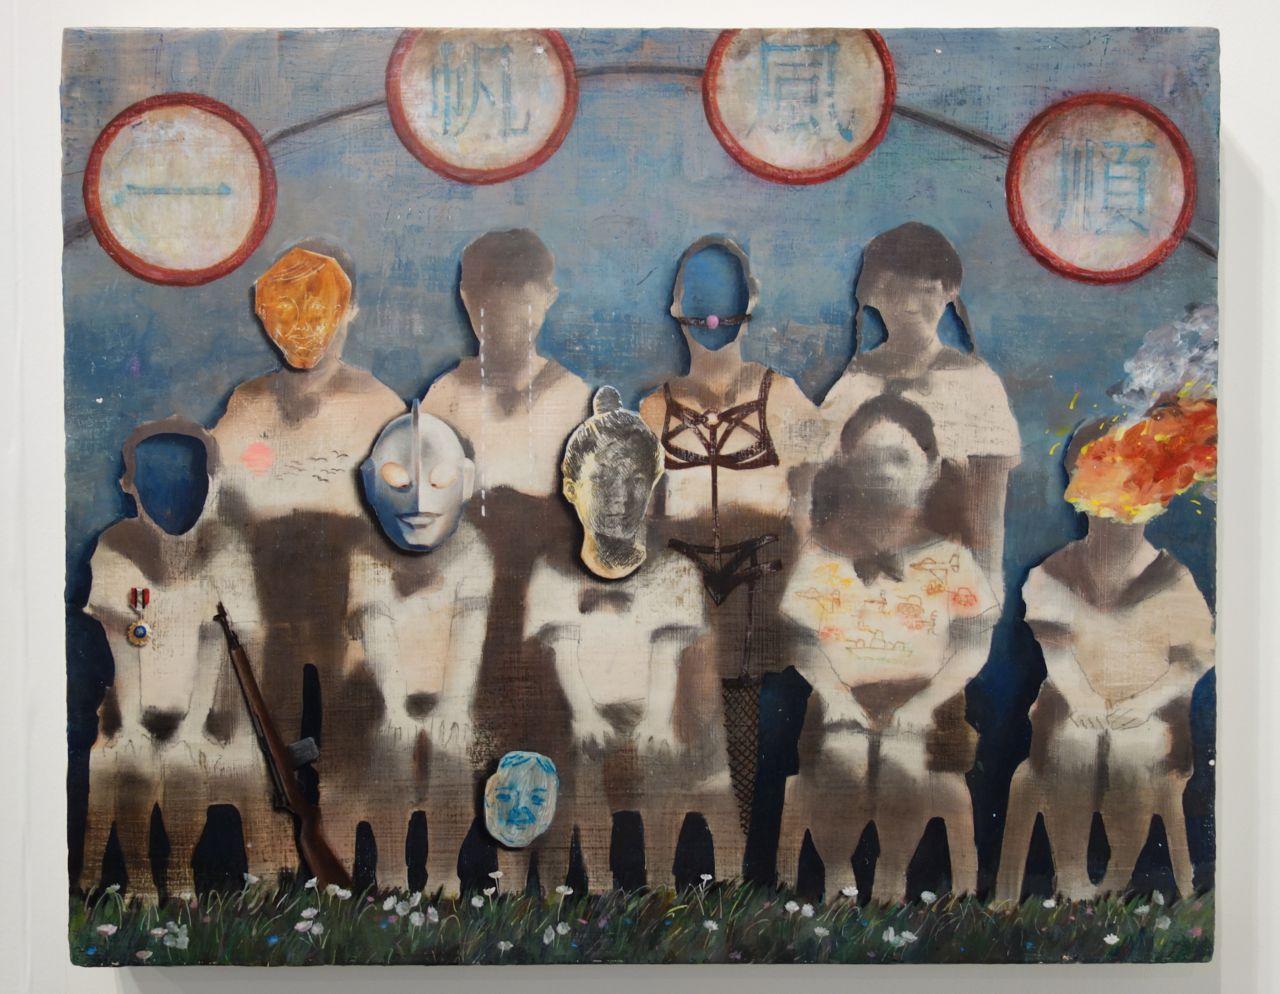 Lai Wei-Yu, 'Plain Sailing', 2016, Acrylic and charcoal on canvas, 53 x 65 cm, Yiri Arts (Taiwan)